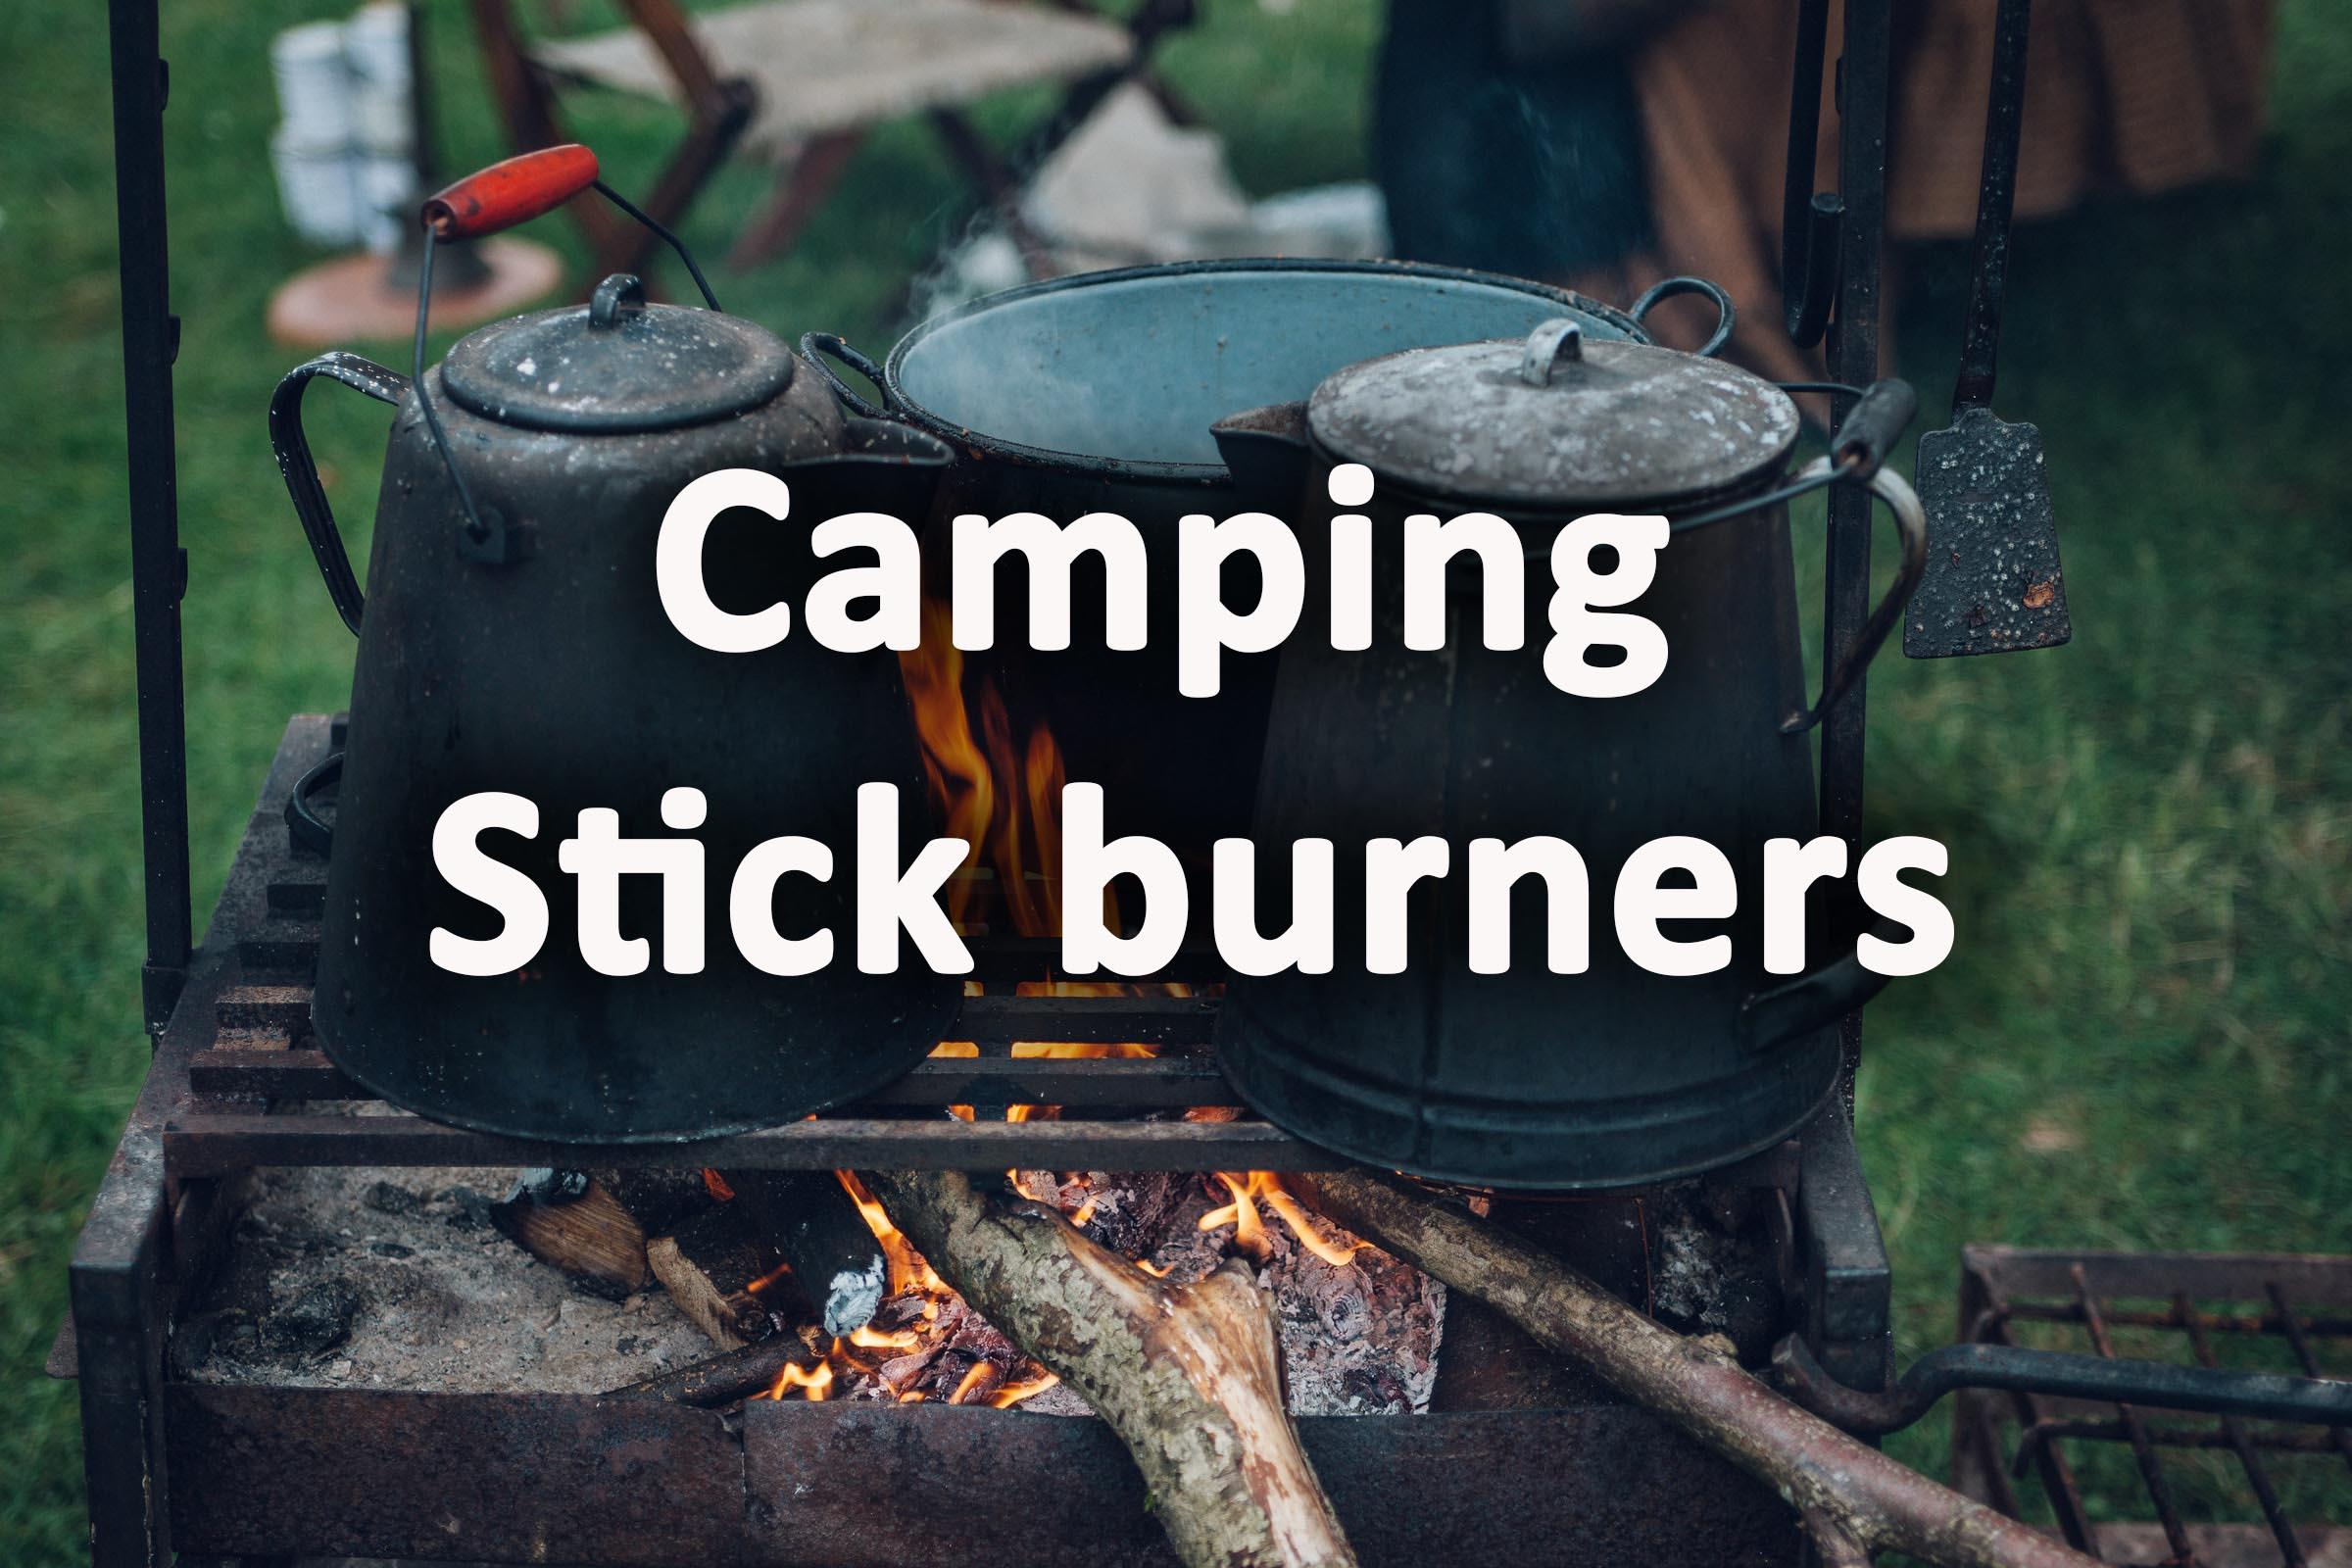 Camping stick burners